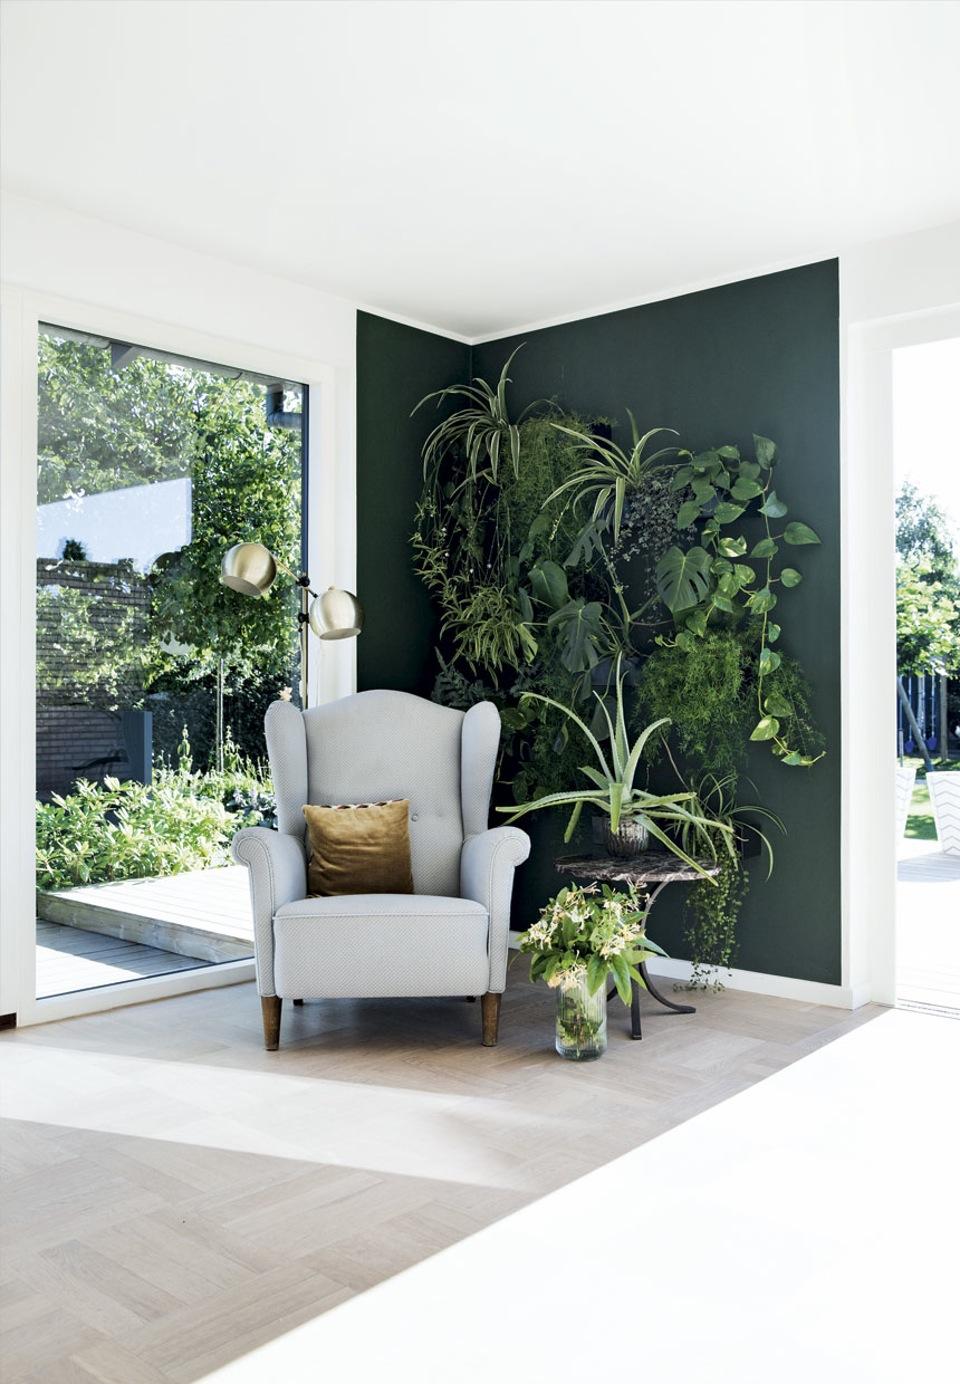 botanisk-hjorne-laenestol-planter-7UUNMCE7APGmpb7cev6KPg